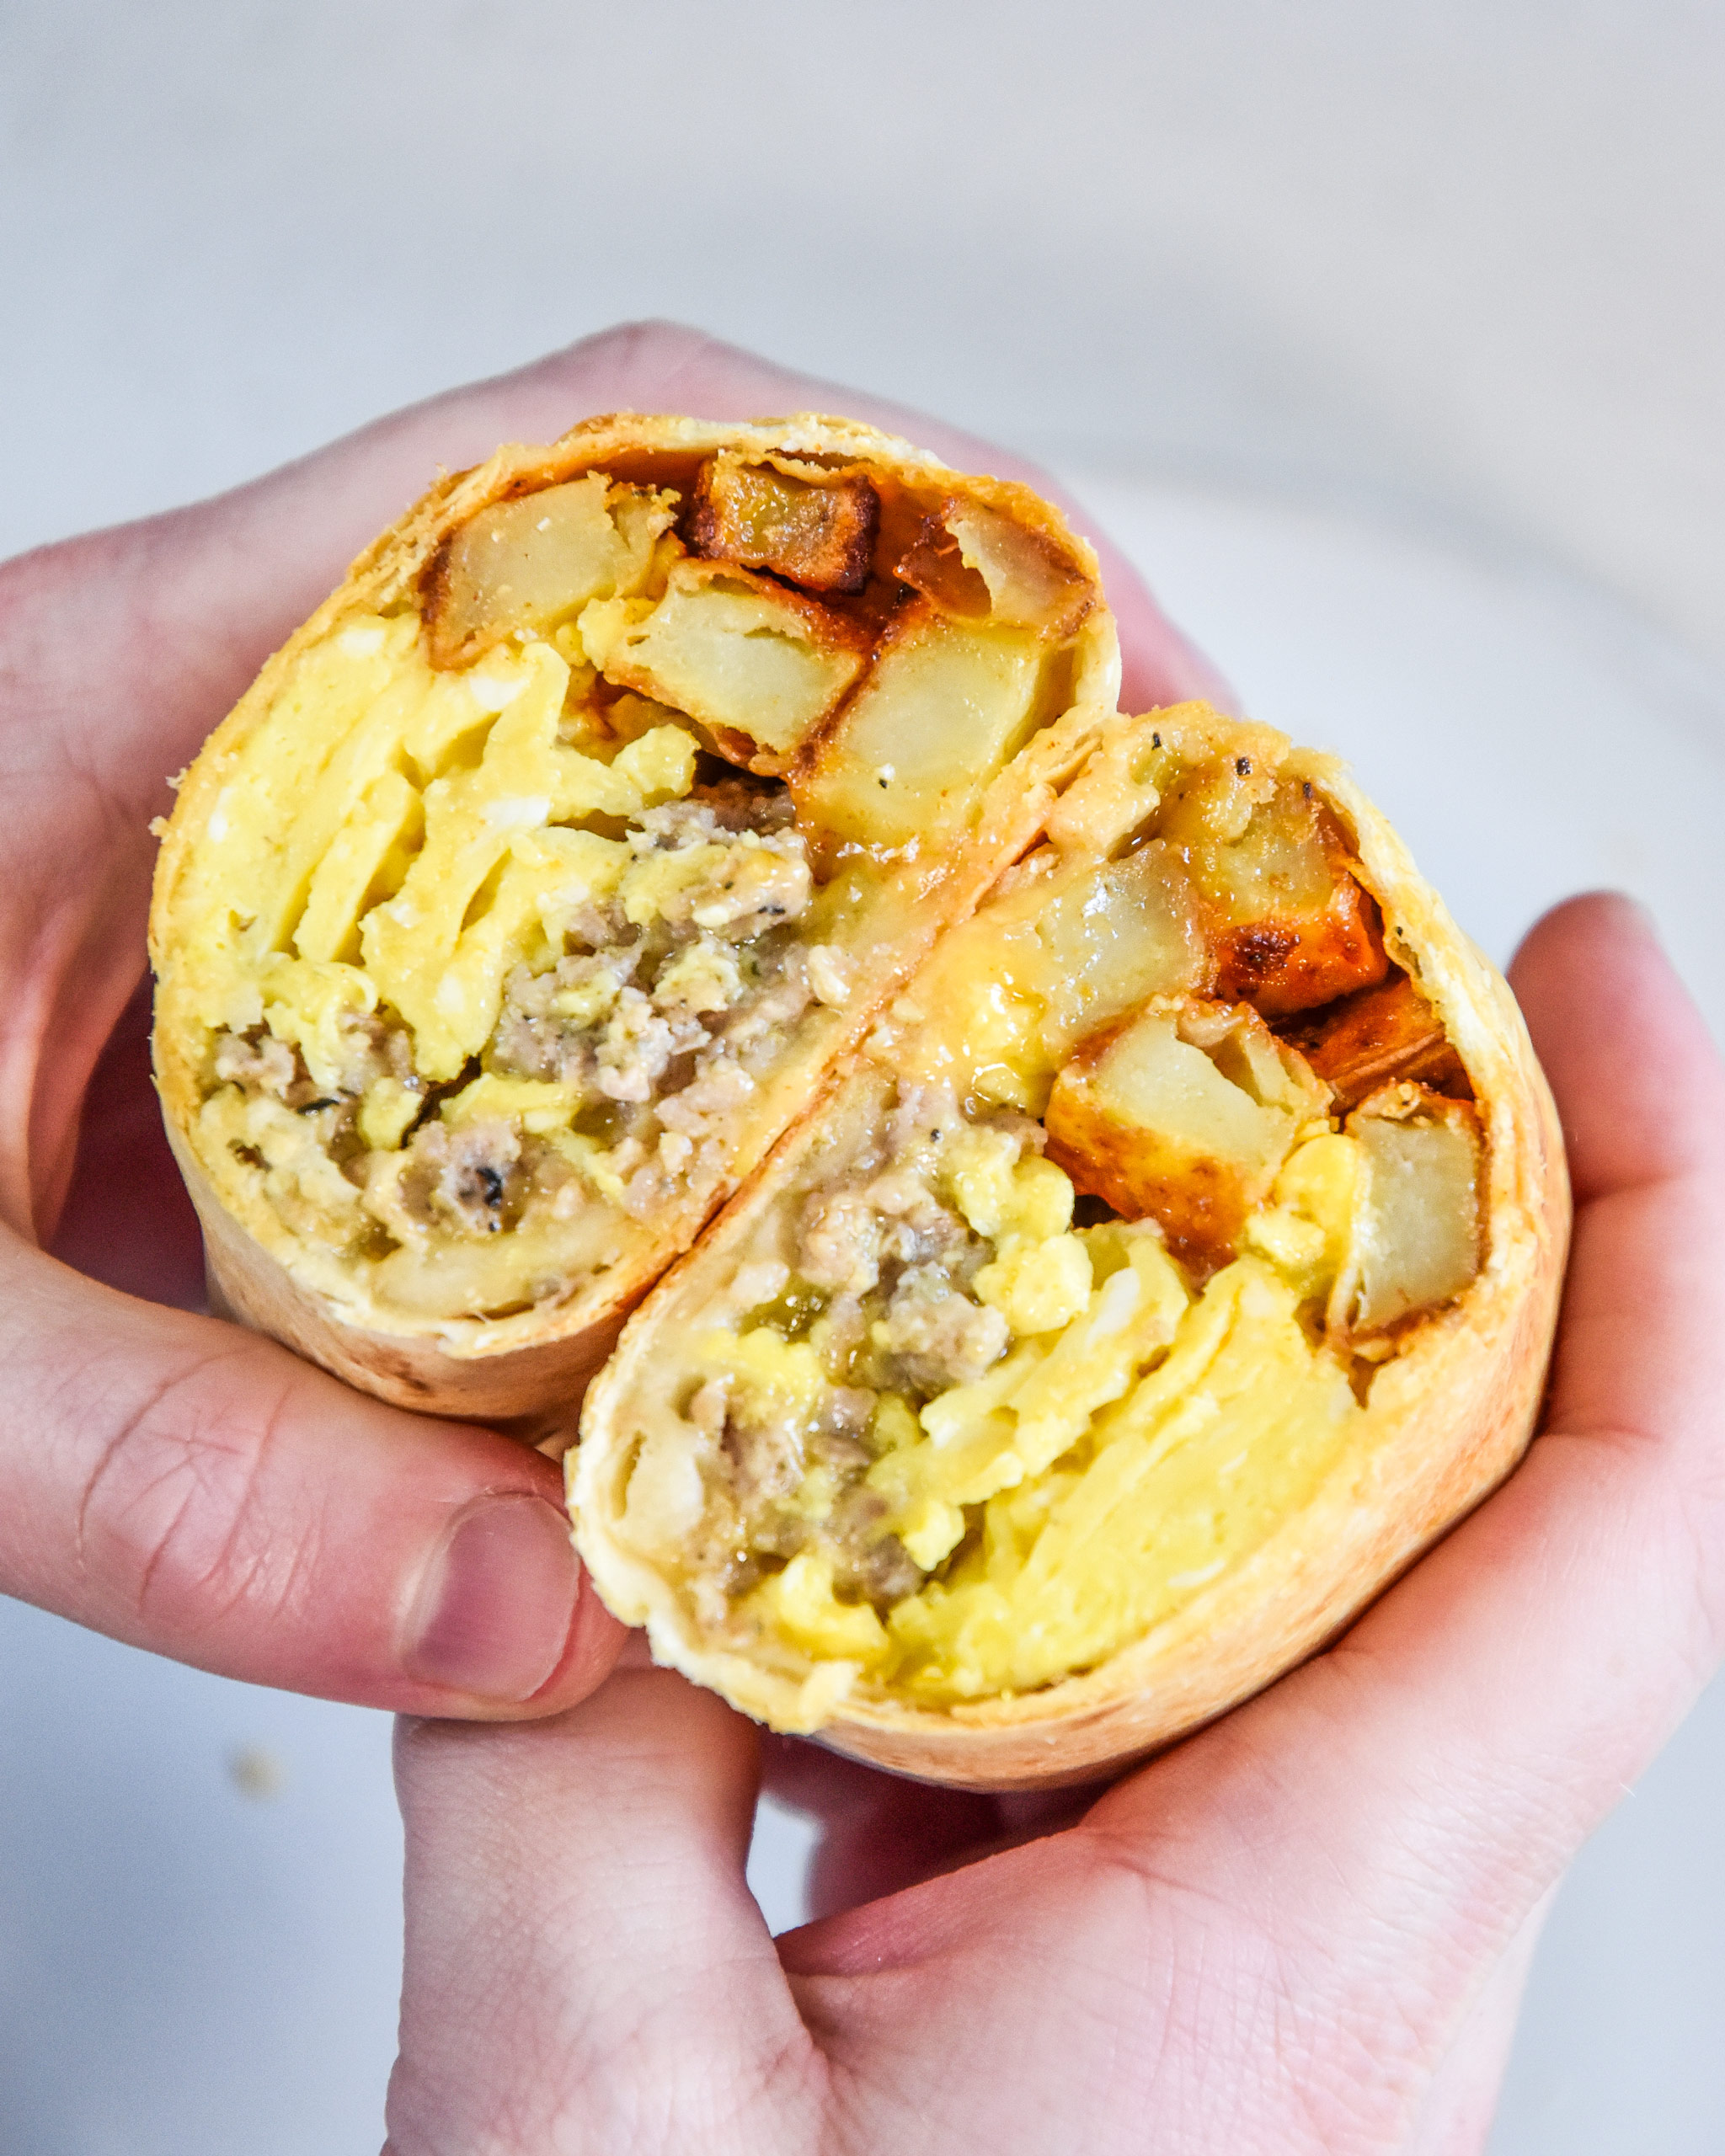 an air fryer breakfast burrito cut in half in someone's hands